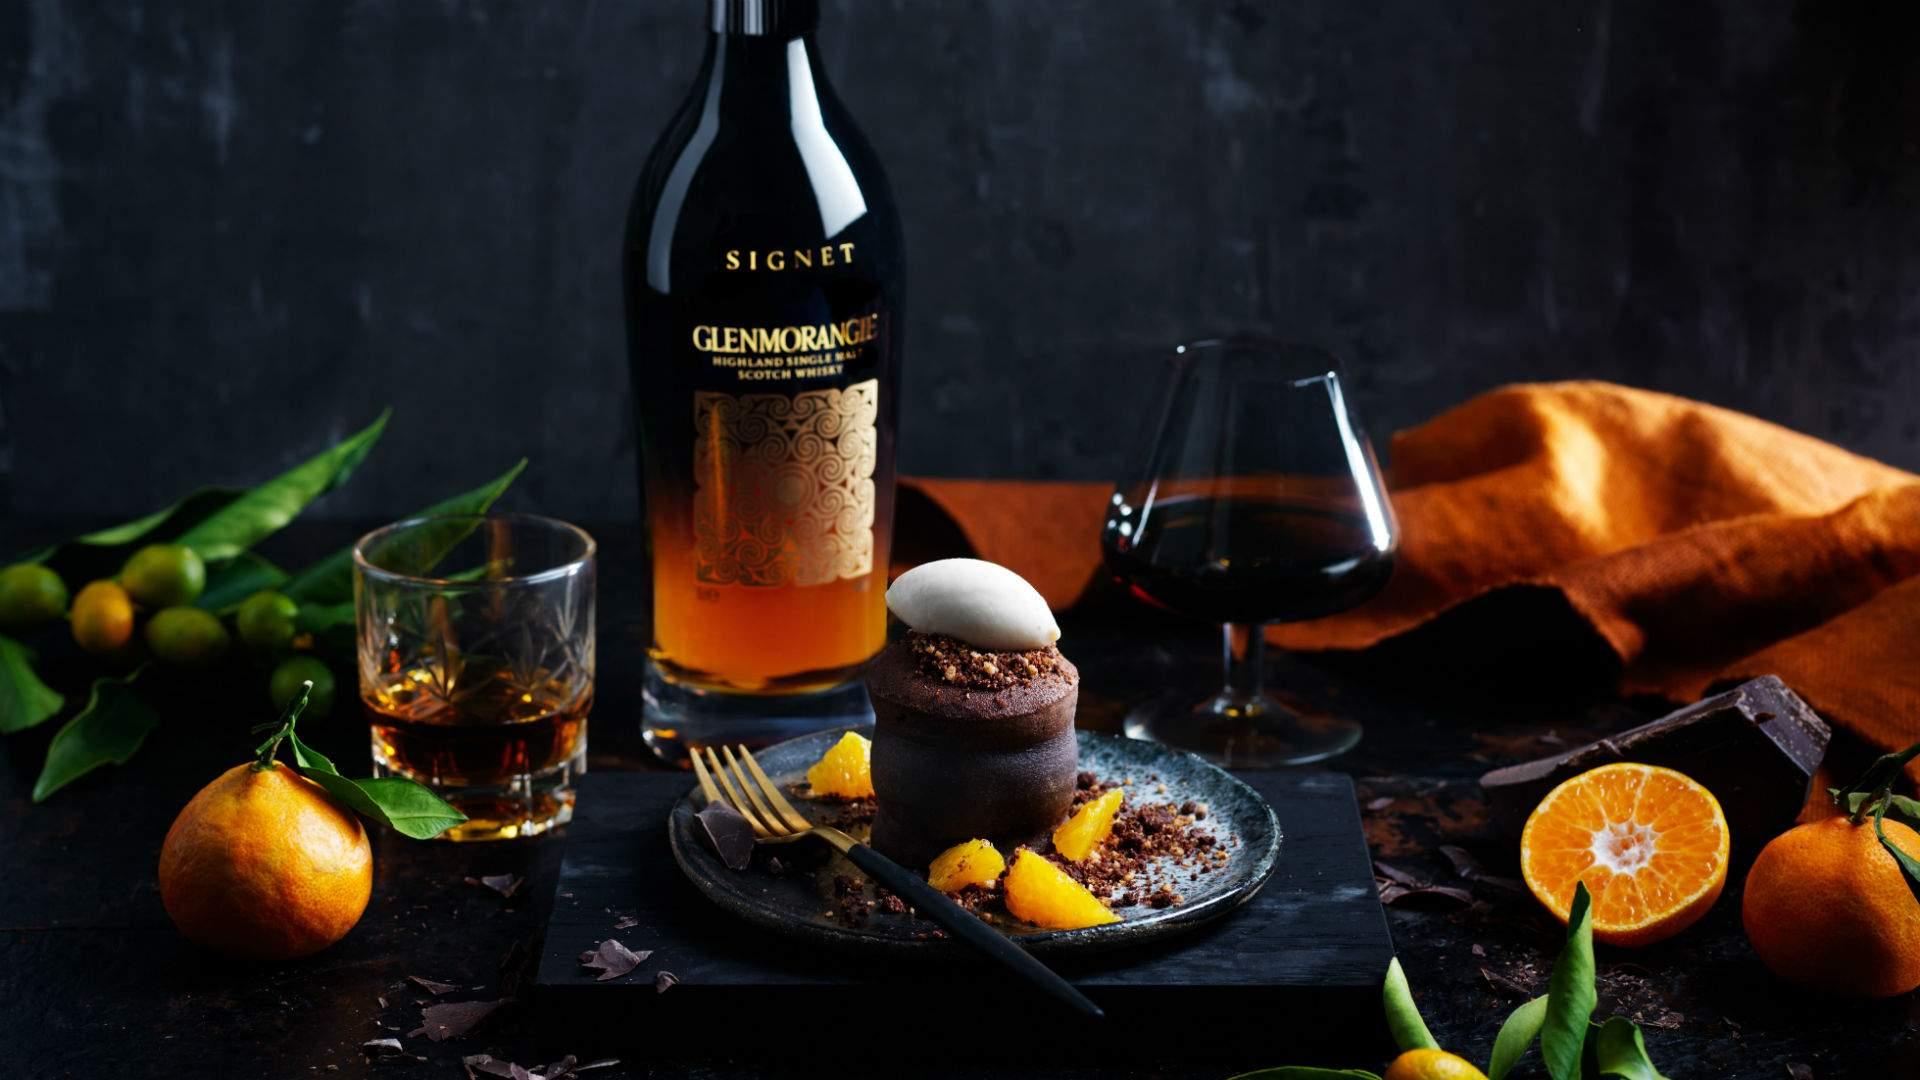 Glenmorangie Signet Pop-Up Whisky And Dessert Bar